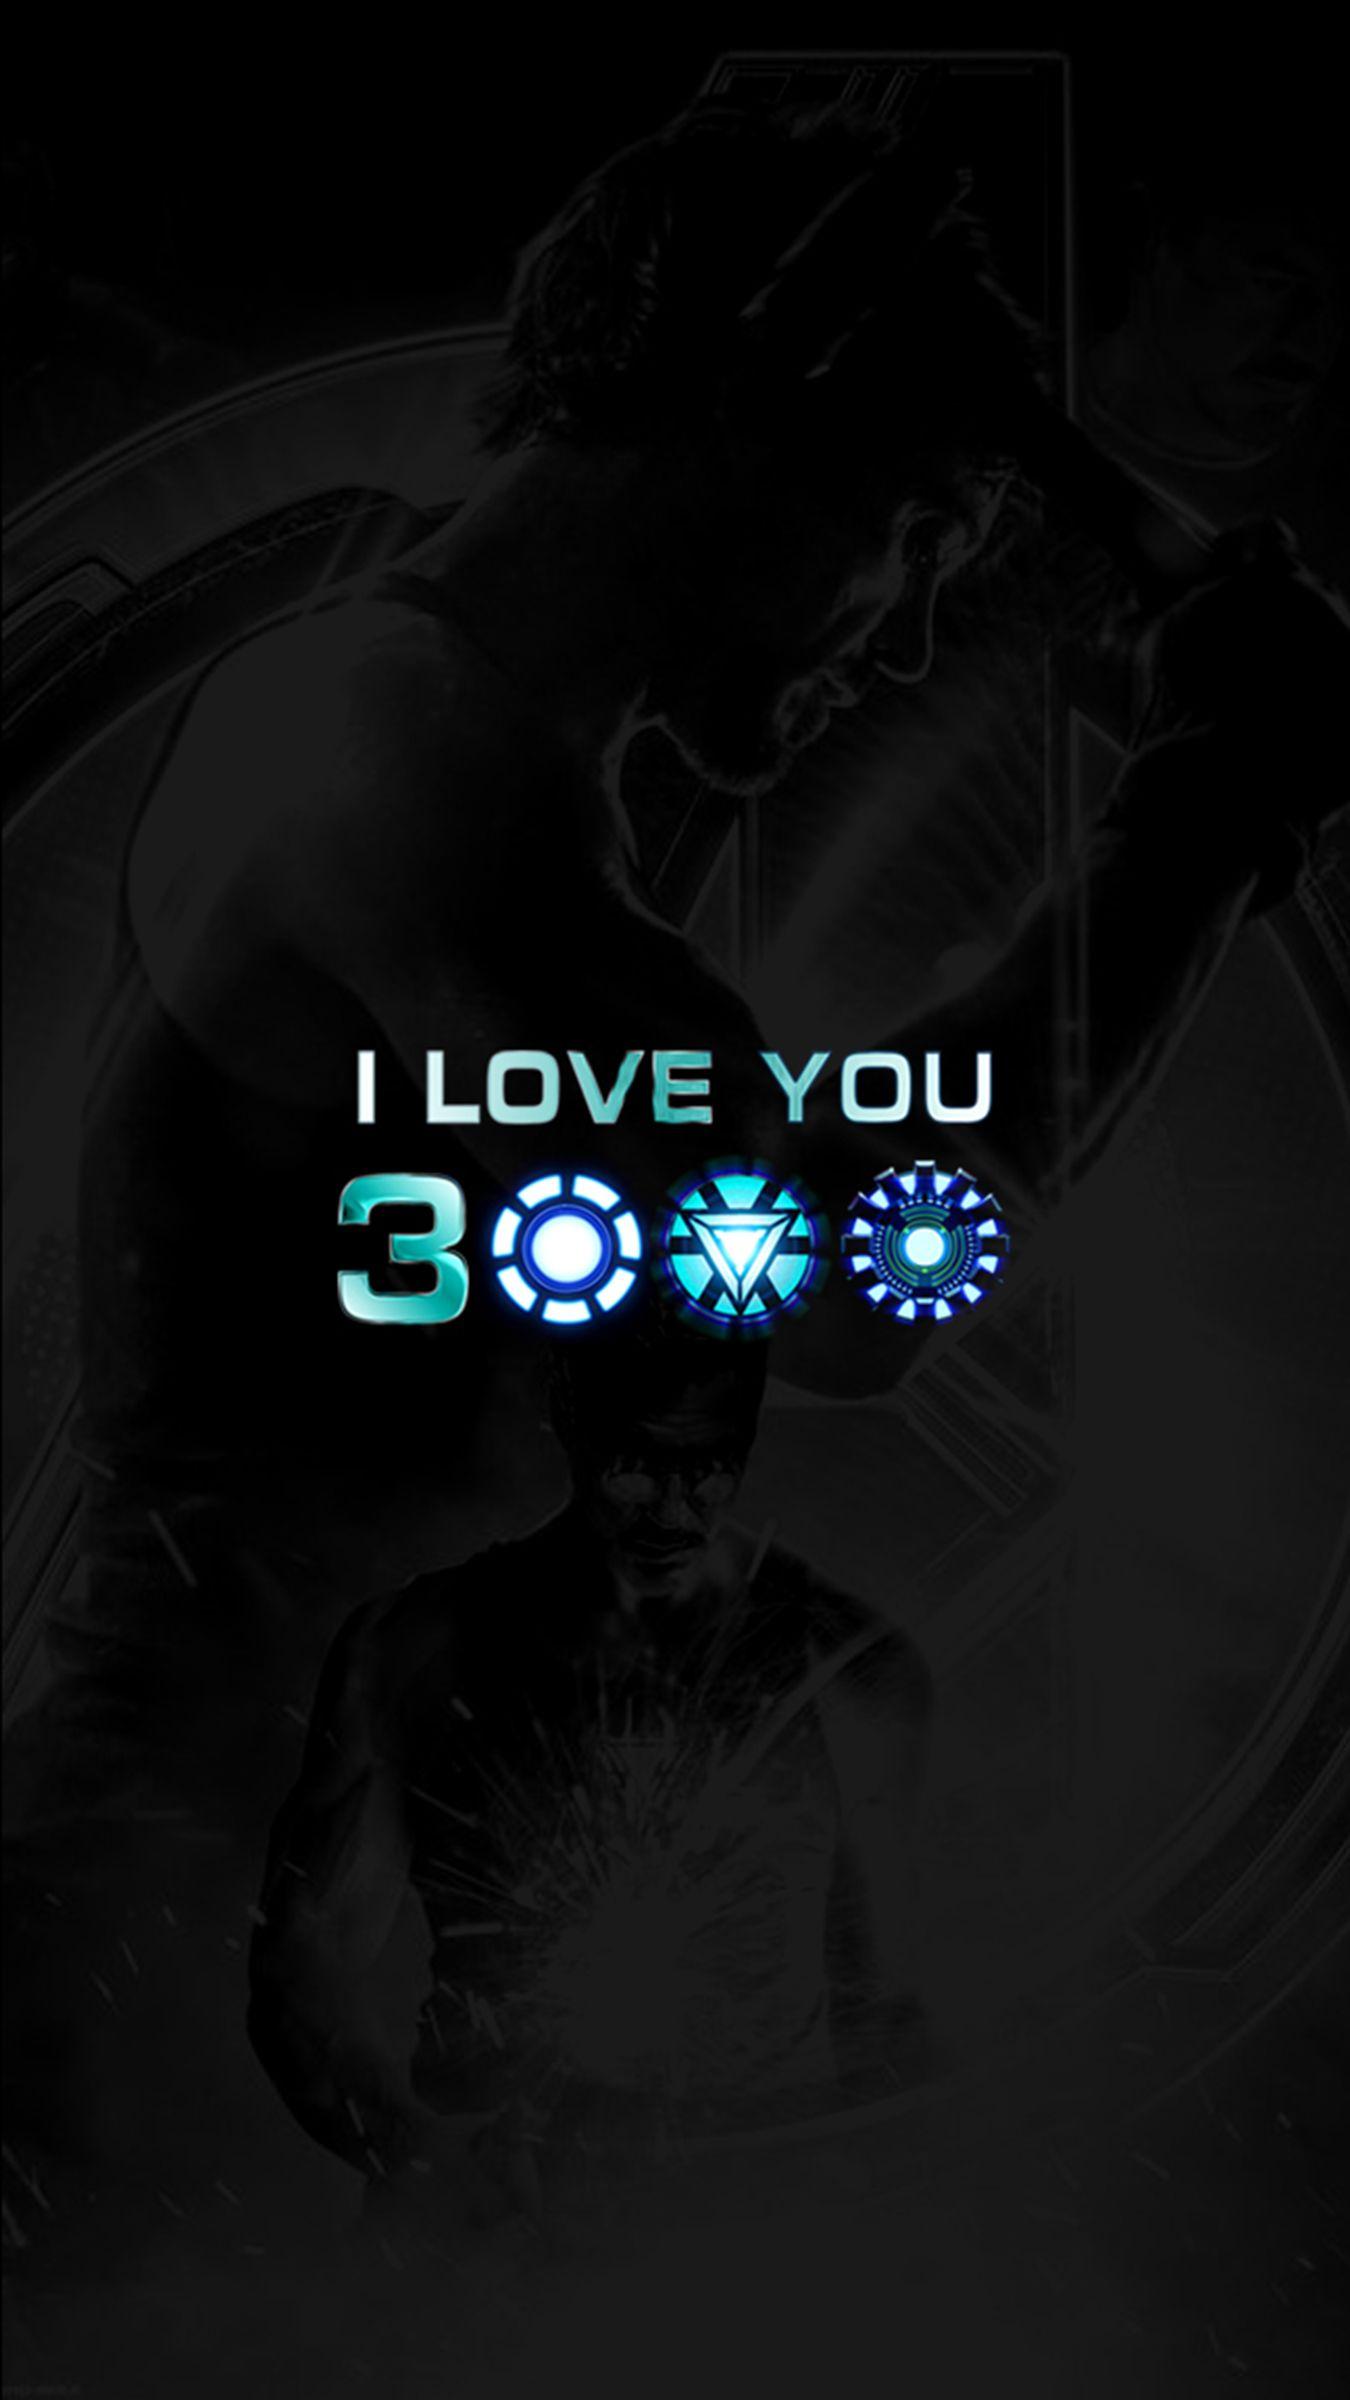 I Love You 3000 - Iron Man